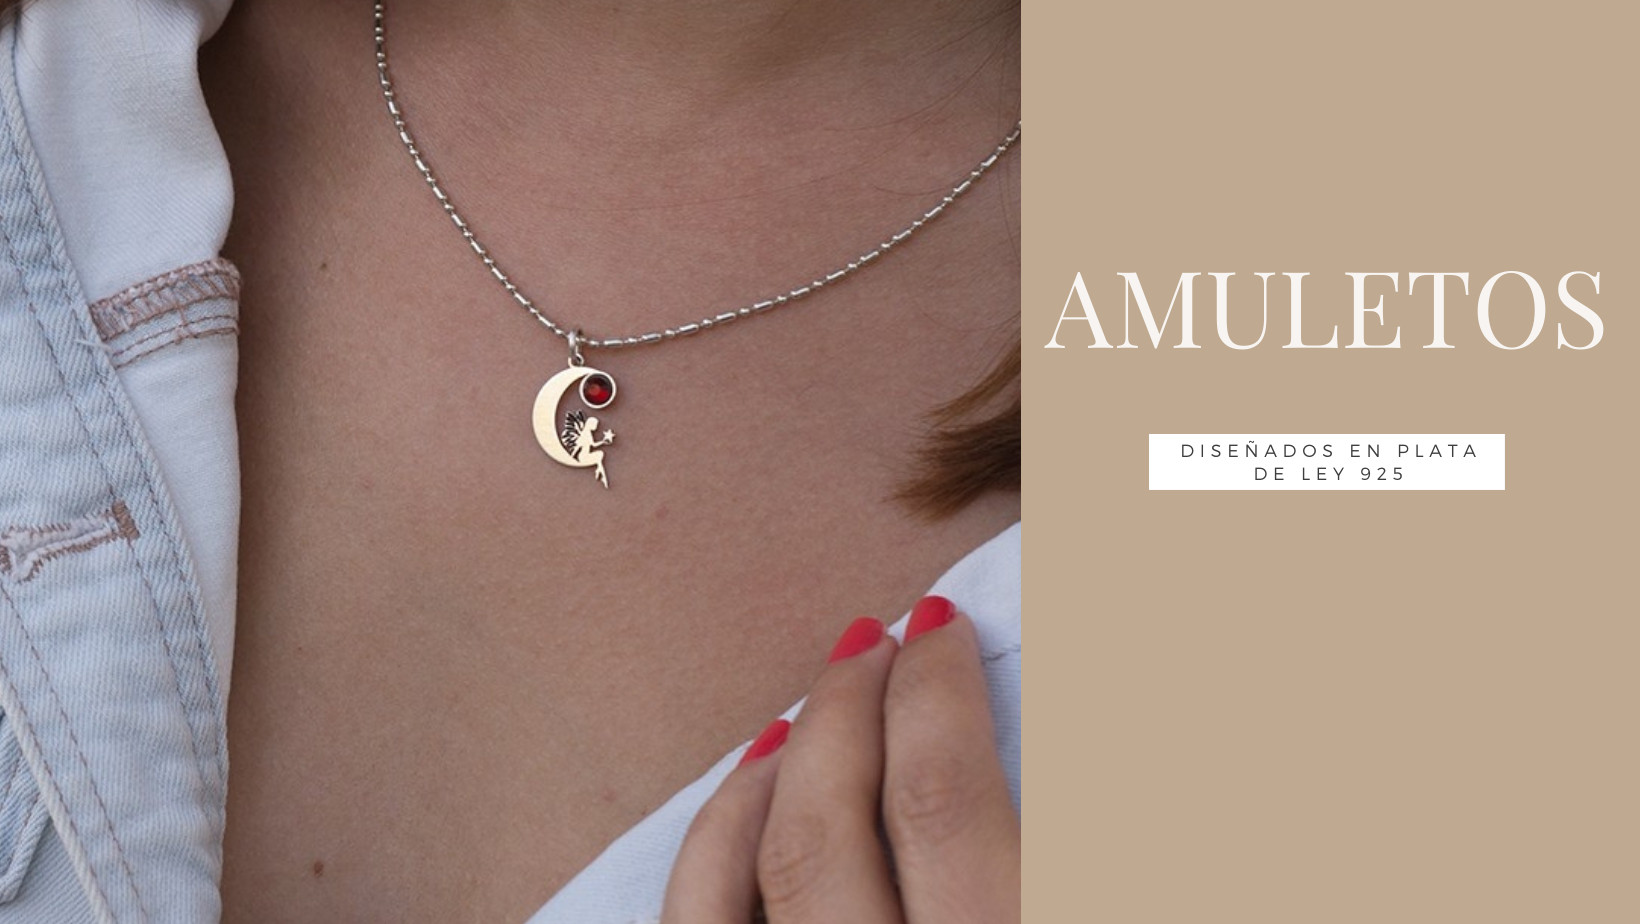 Amuletos en plata